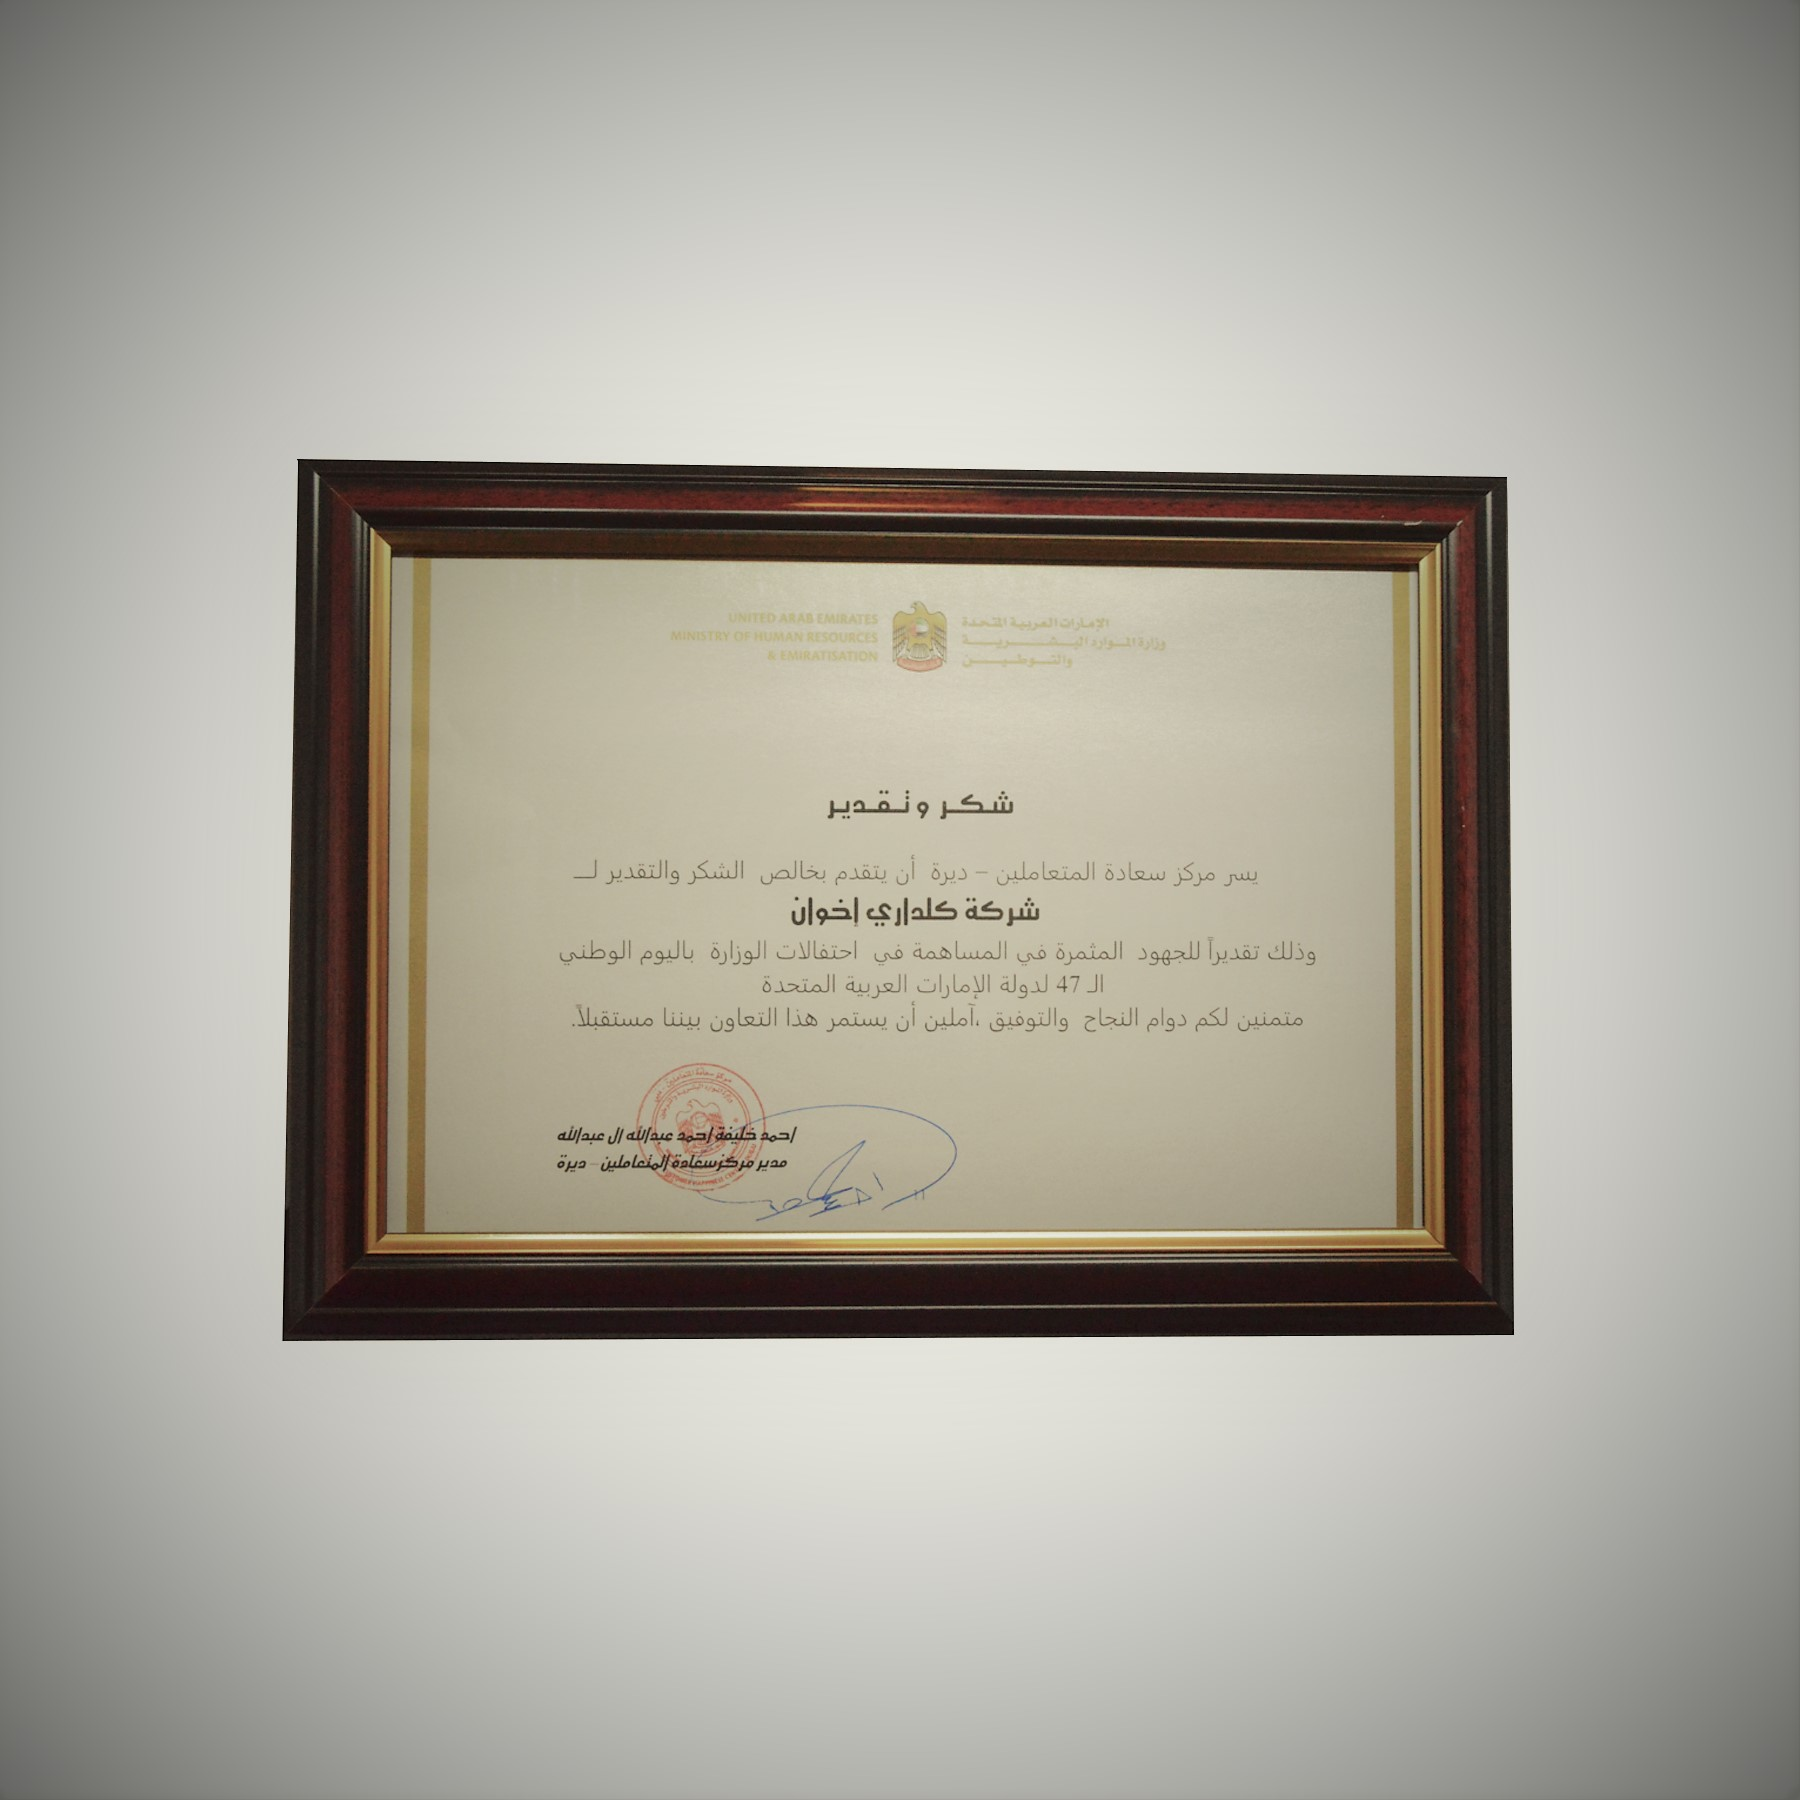 UAE Ministry of Human Resources & Emiratisation